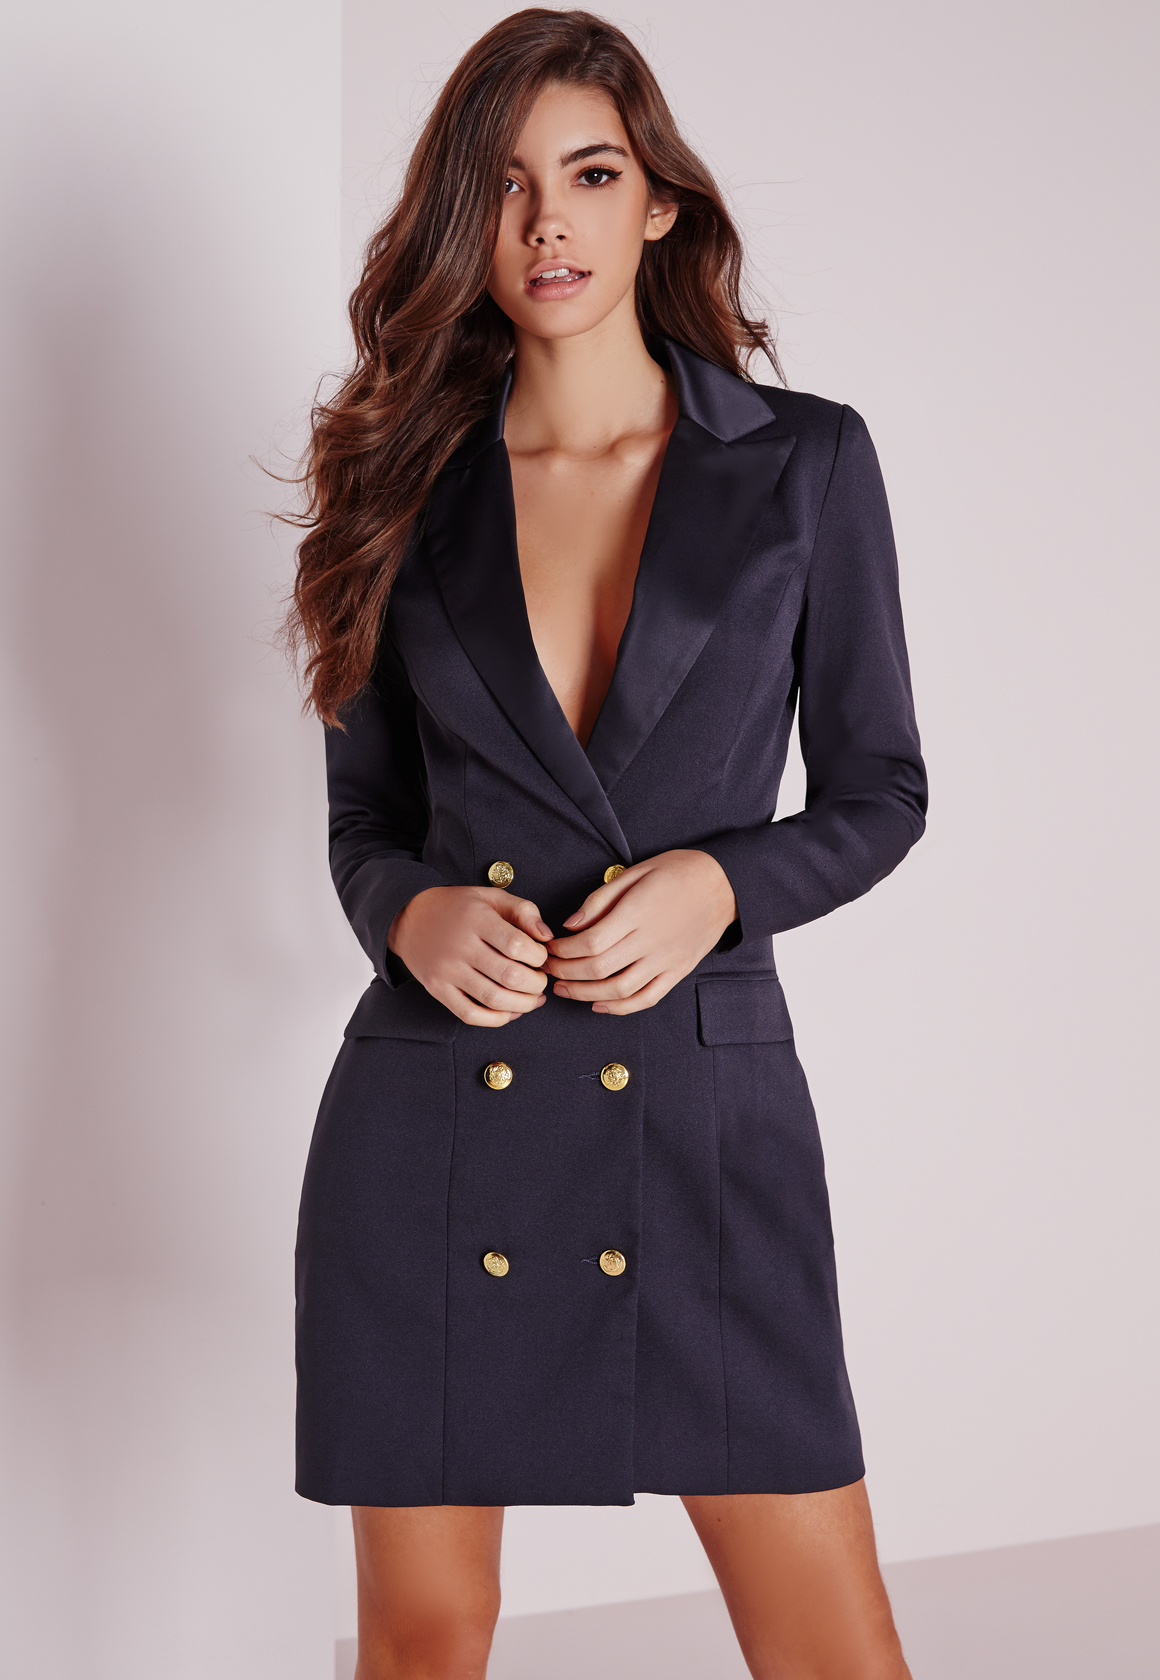 Missguided Long Sleeve Tuxedo Dress Navy in Blue